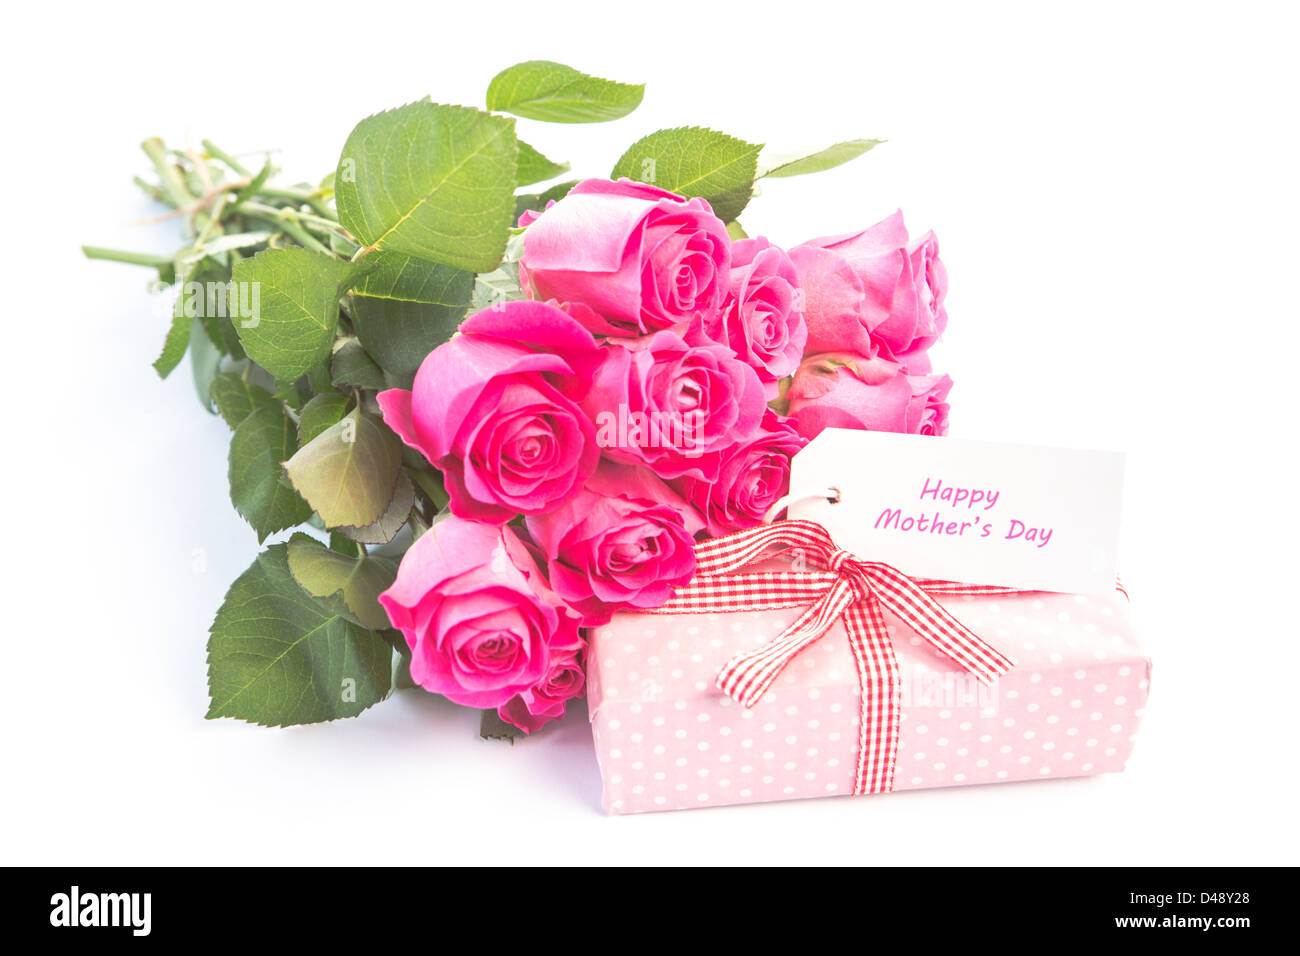 Happy birthday flower bouquet roses